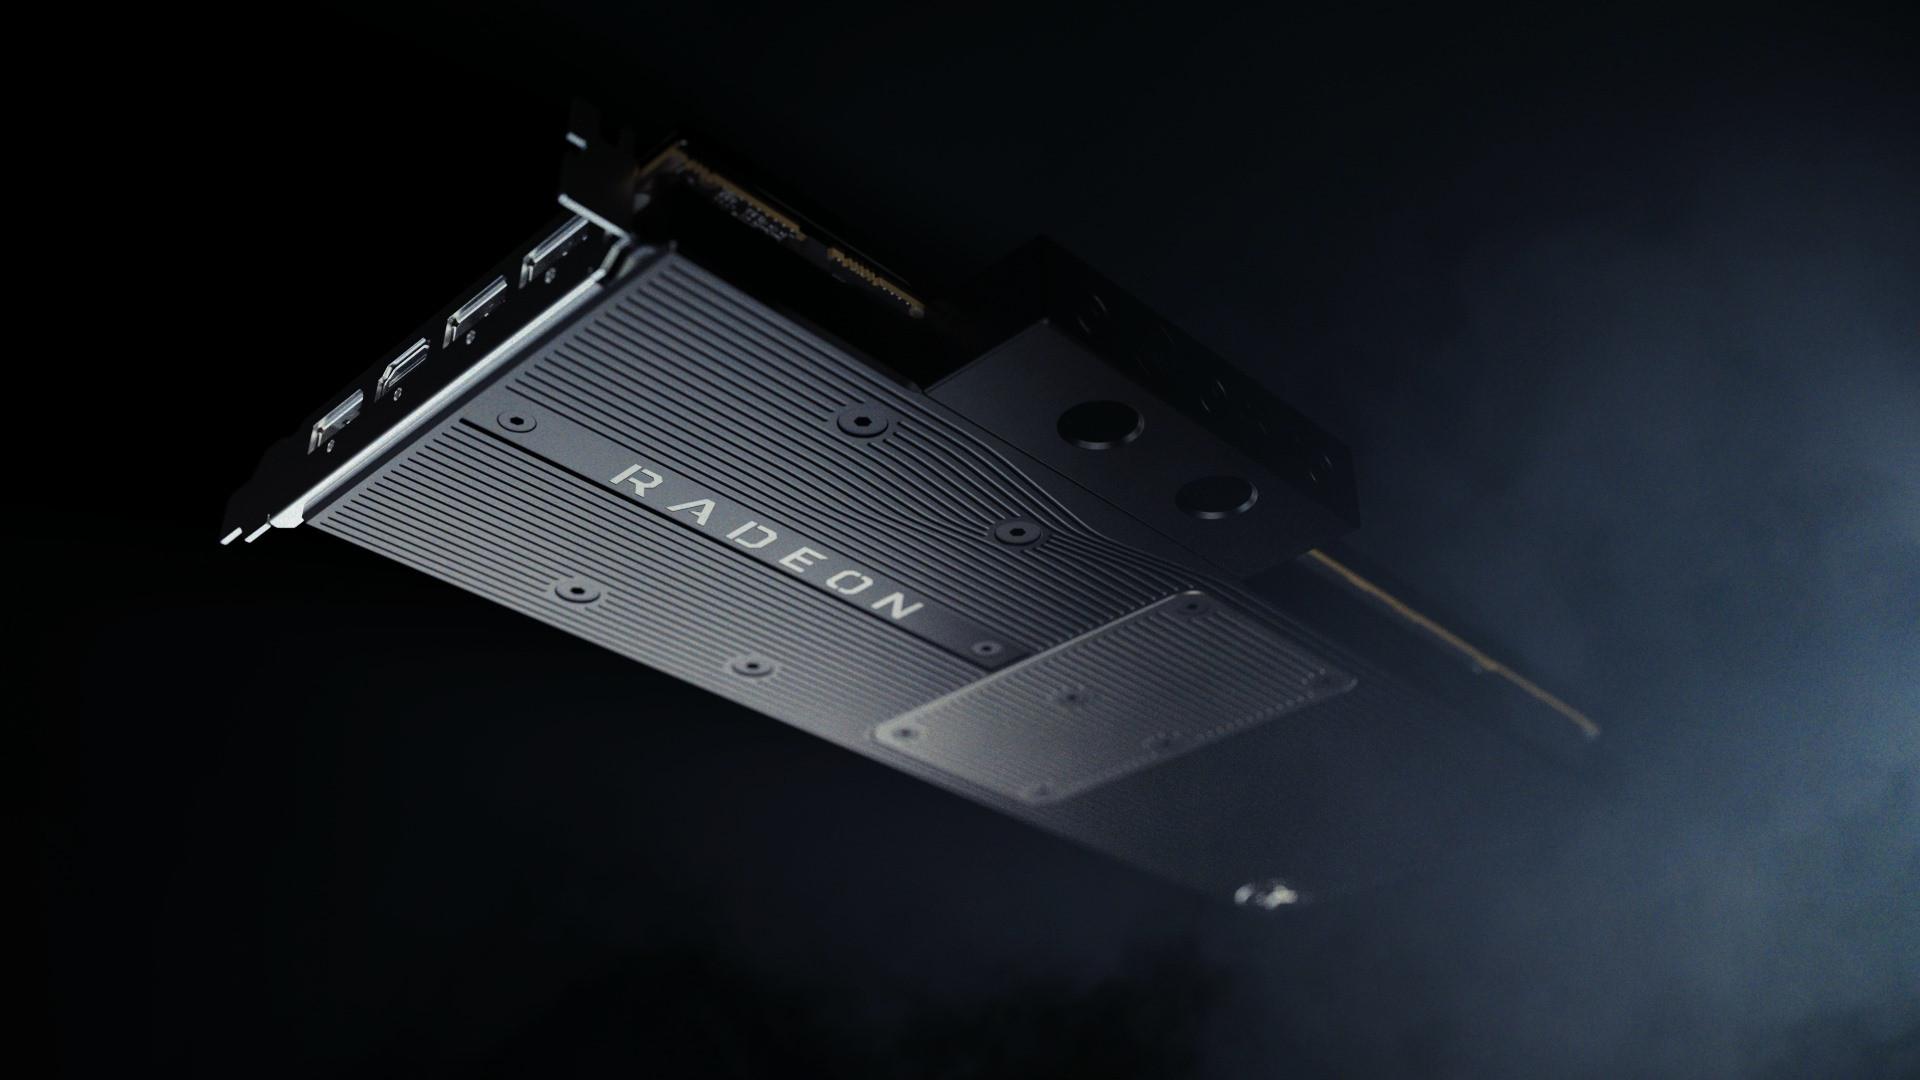 EK Teases its Premium Full-coverage Water Block for AMD Navi